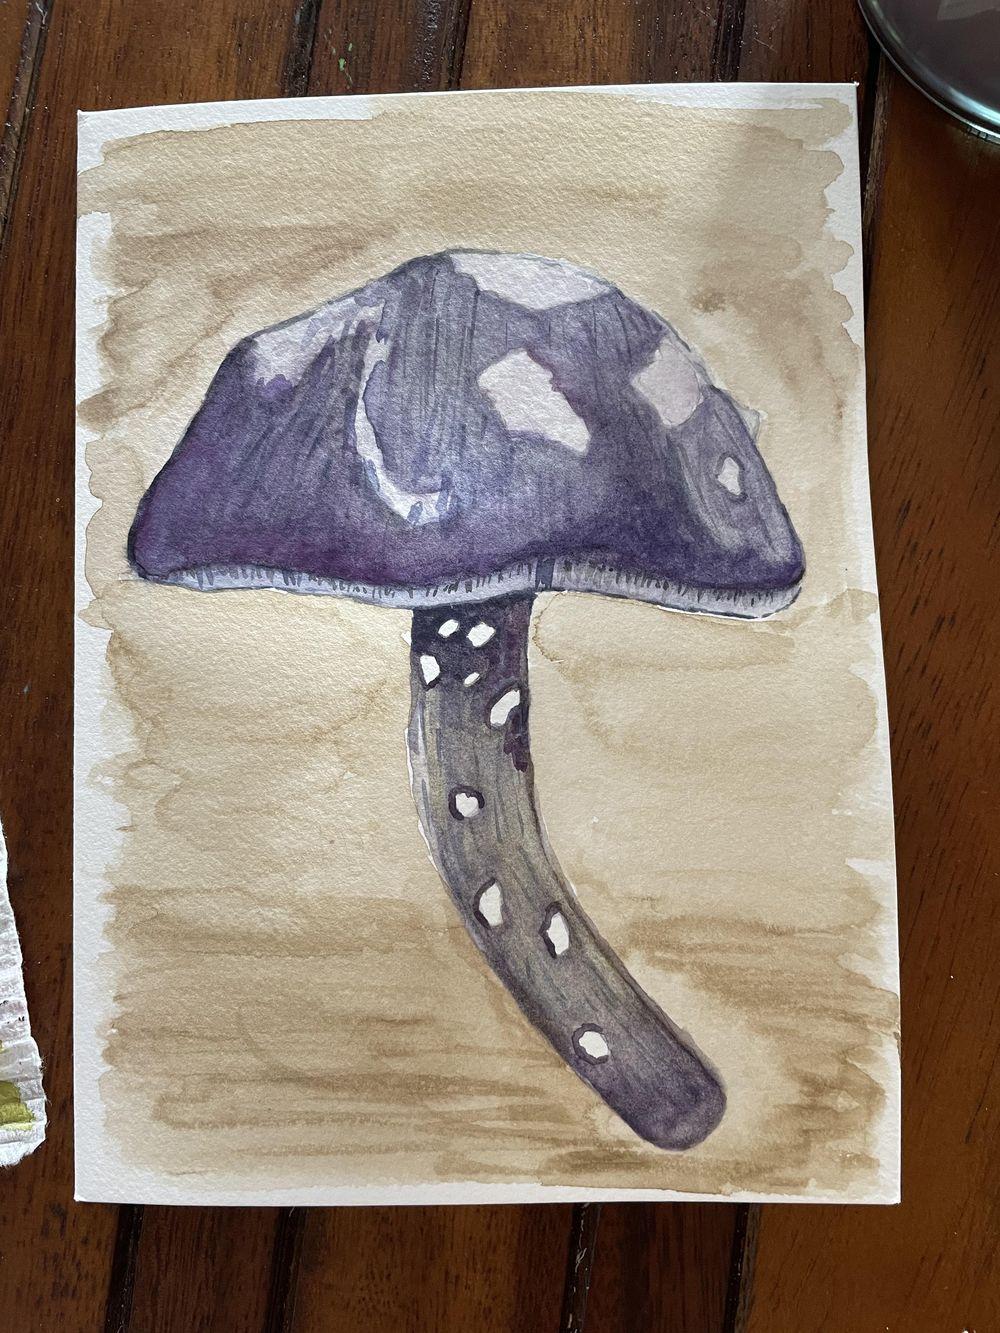 Mushroom card - image 2 - student project